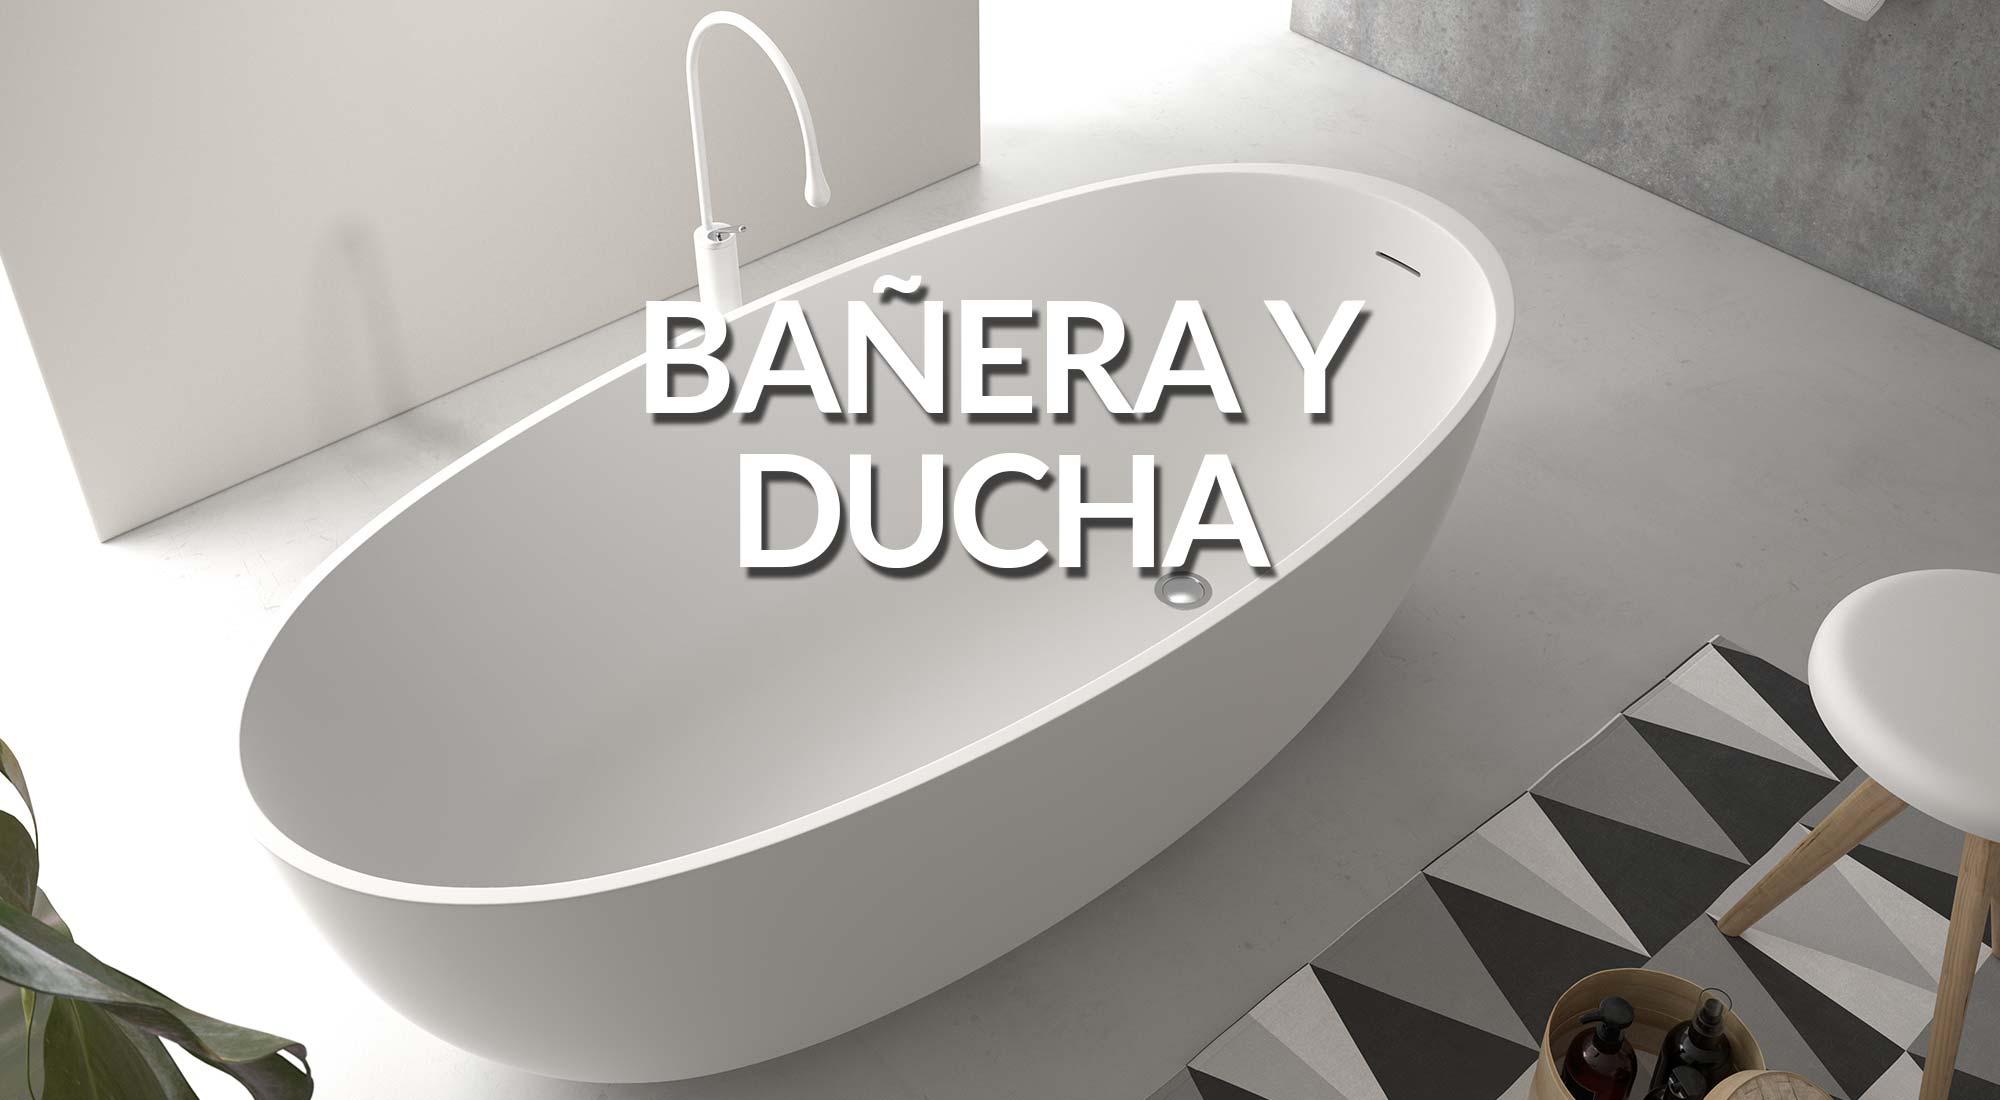 Bañera y ducha 1